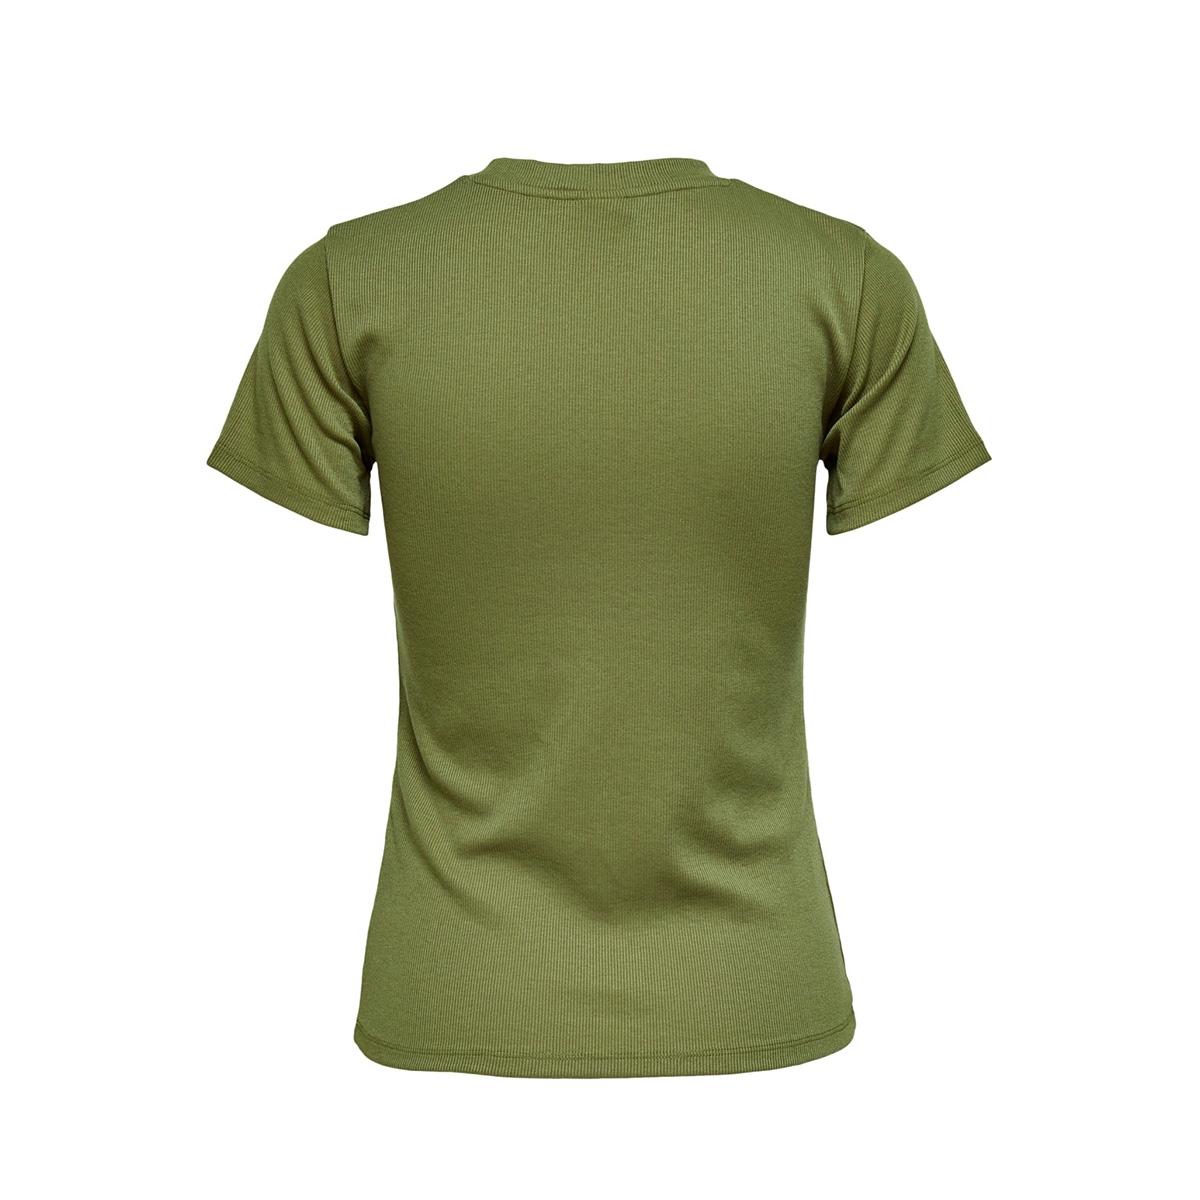 jdykissa s/s top jrs 15200591 jacqueline de yong t-shirt martini olive